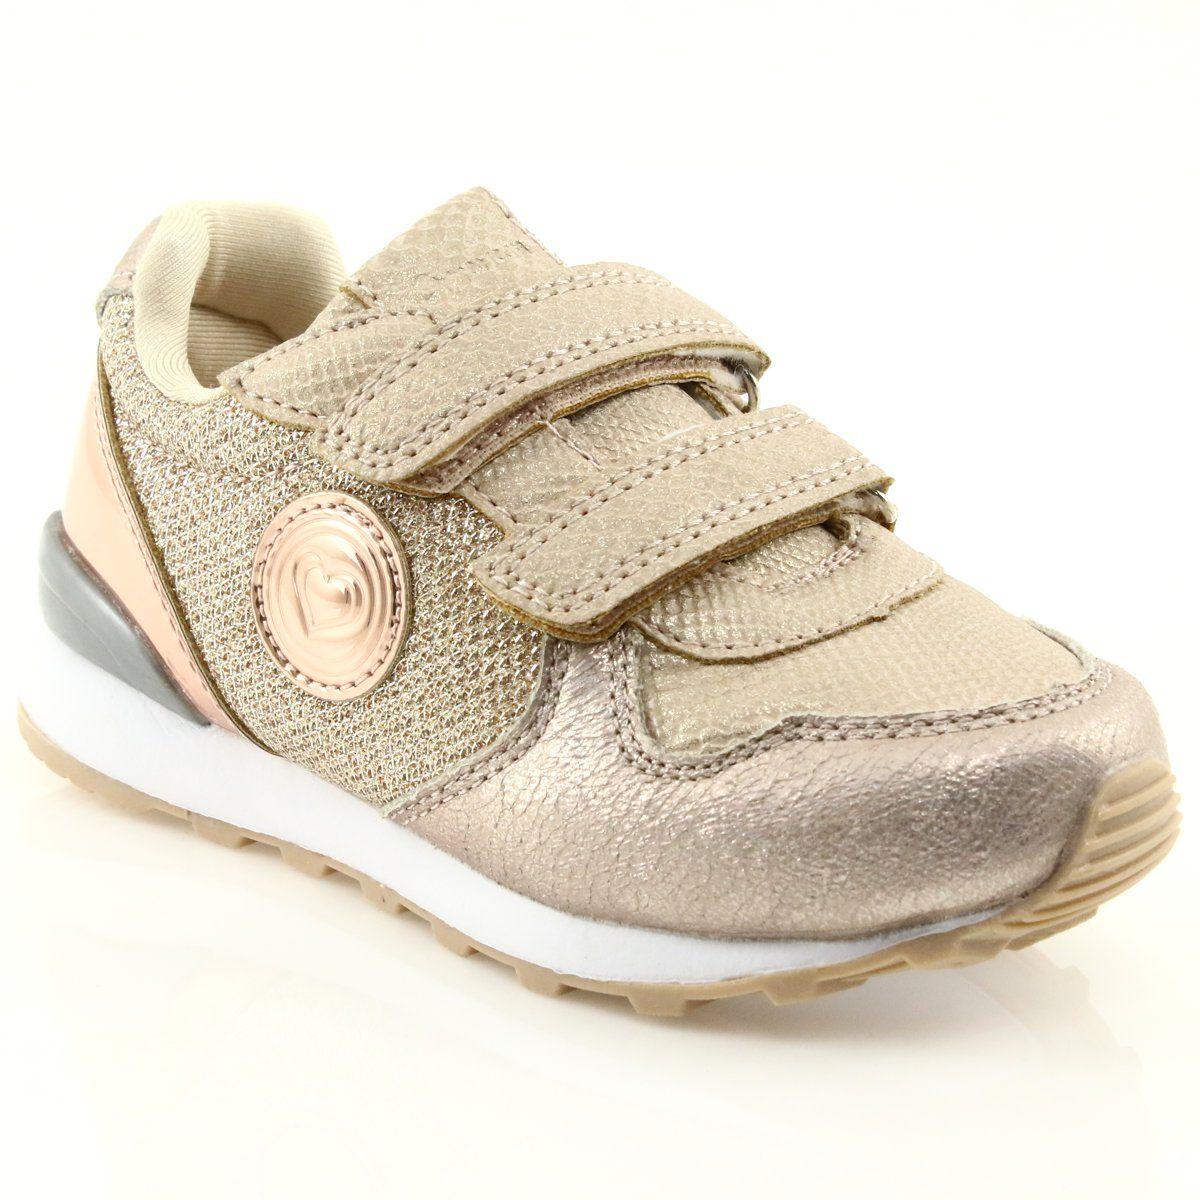 Zlote Buty Sportowe American Club Es26 Zloty Sports Shoes Sports Footwear Shoes